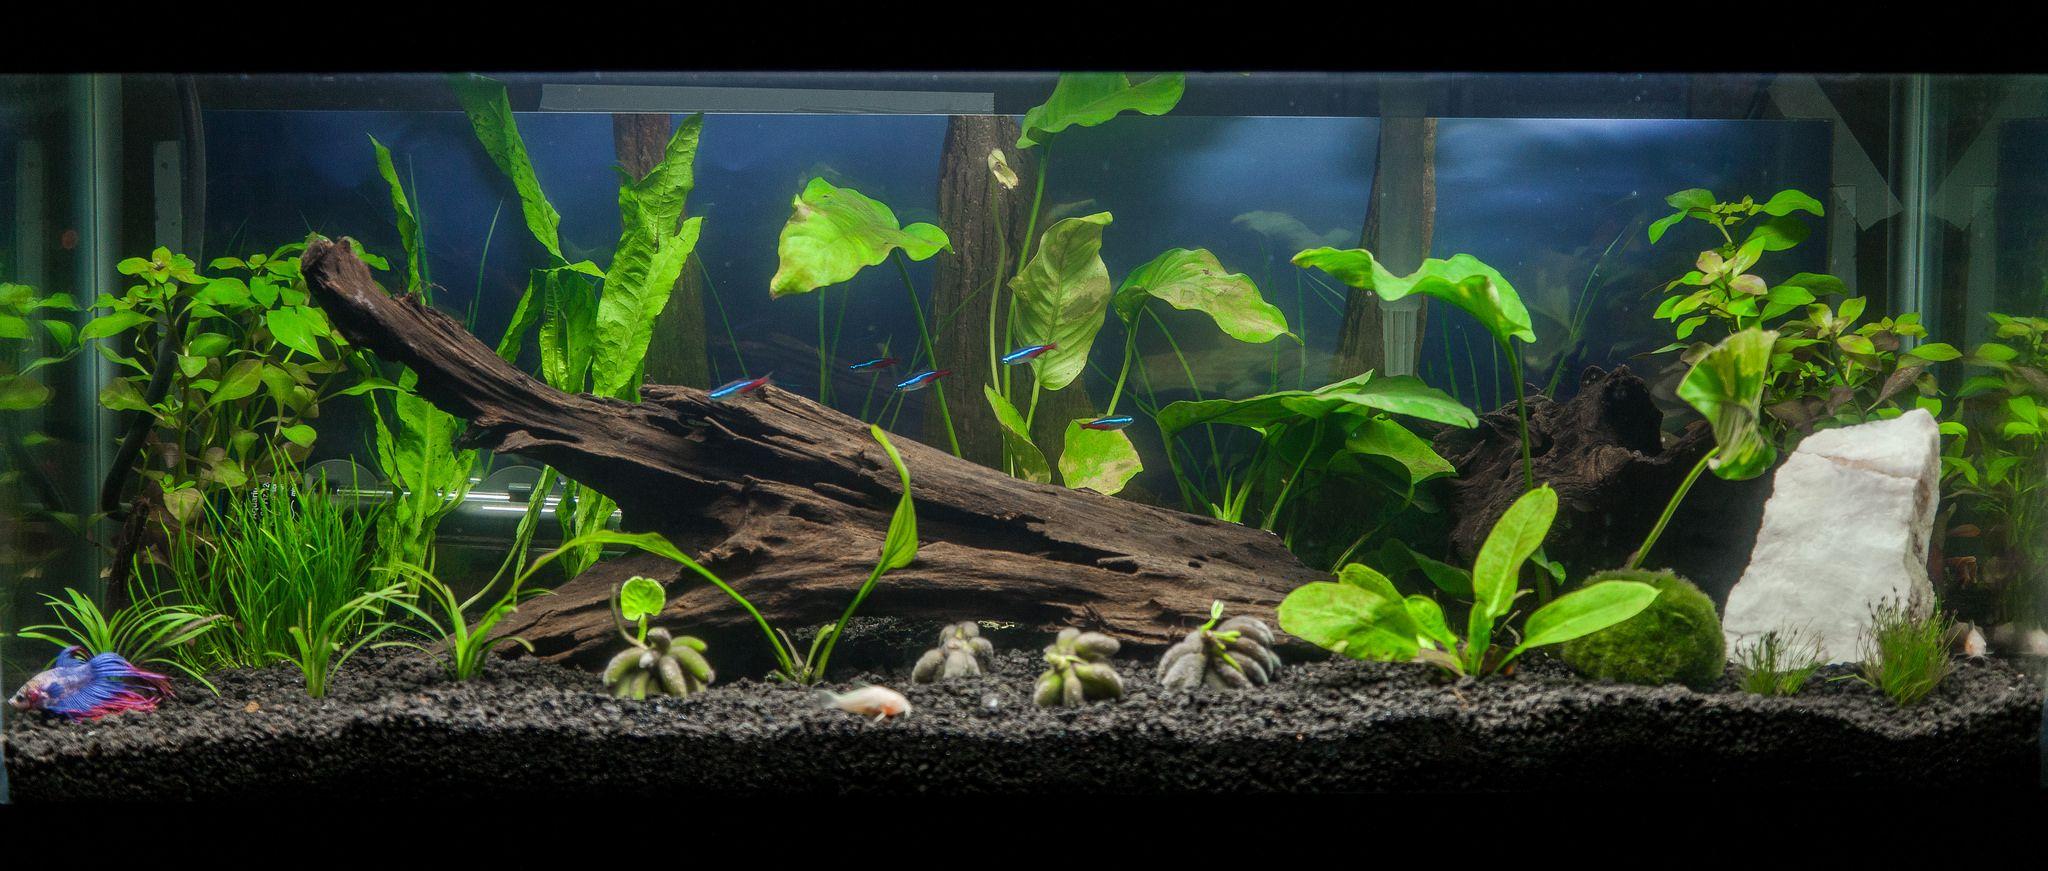 Gallonplantedtank aquariums